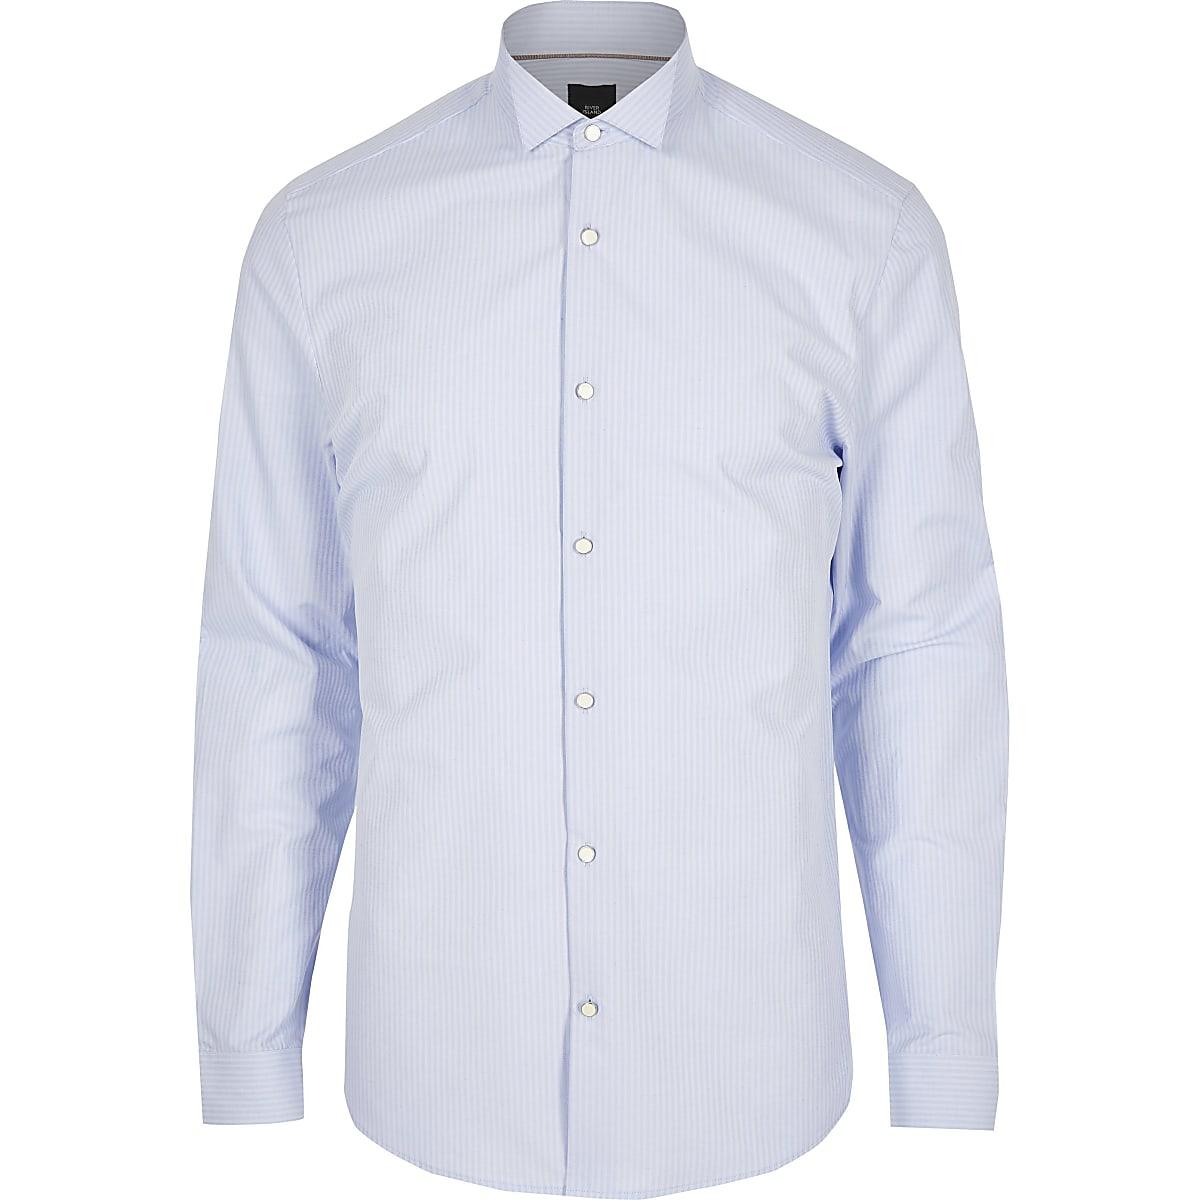 Overhemd Bloemen Boord.Blue Stripe Wing Collar Slim Fit Shirt